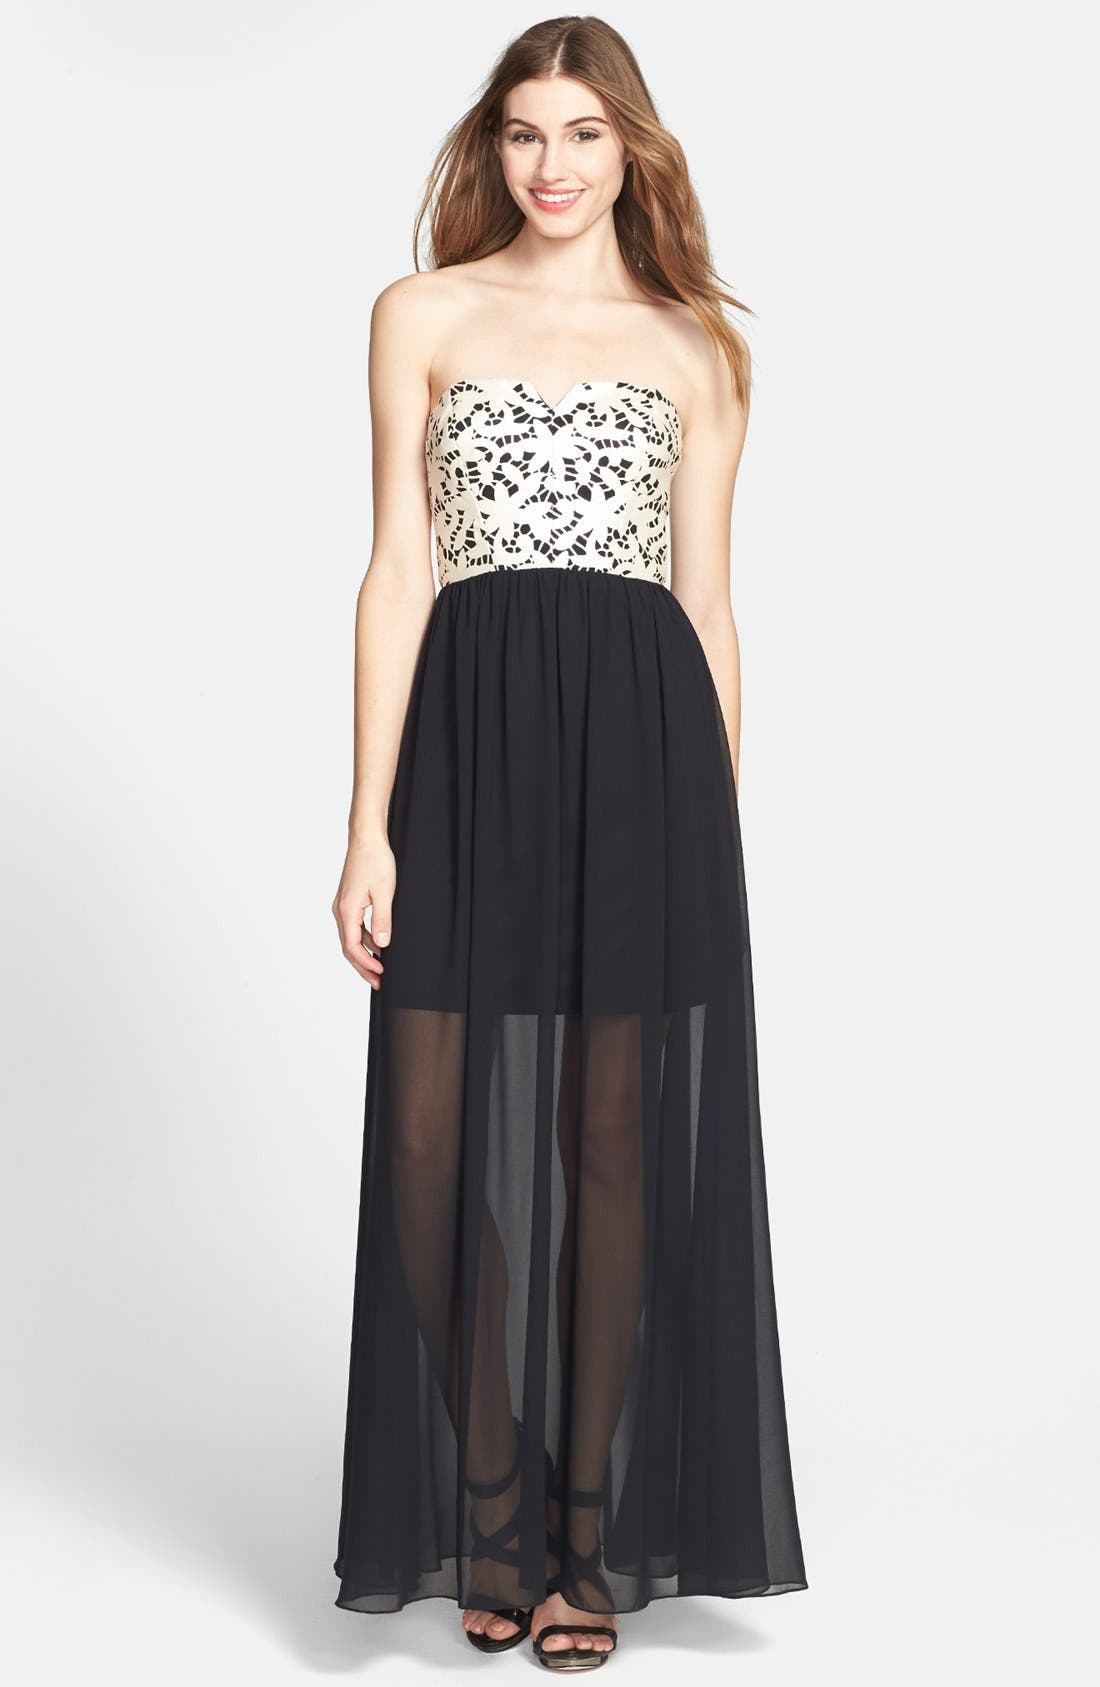 Alternate Image 1 Selected - Betsey Johnson Laser Cut Faux Leather & Chiffon Maxi Dress